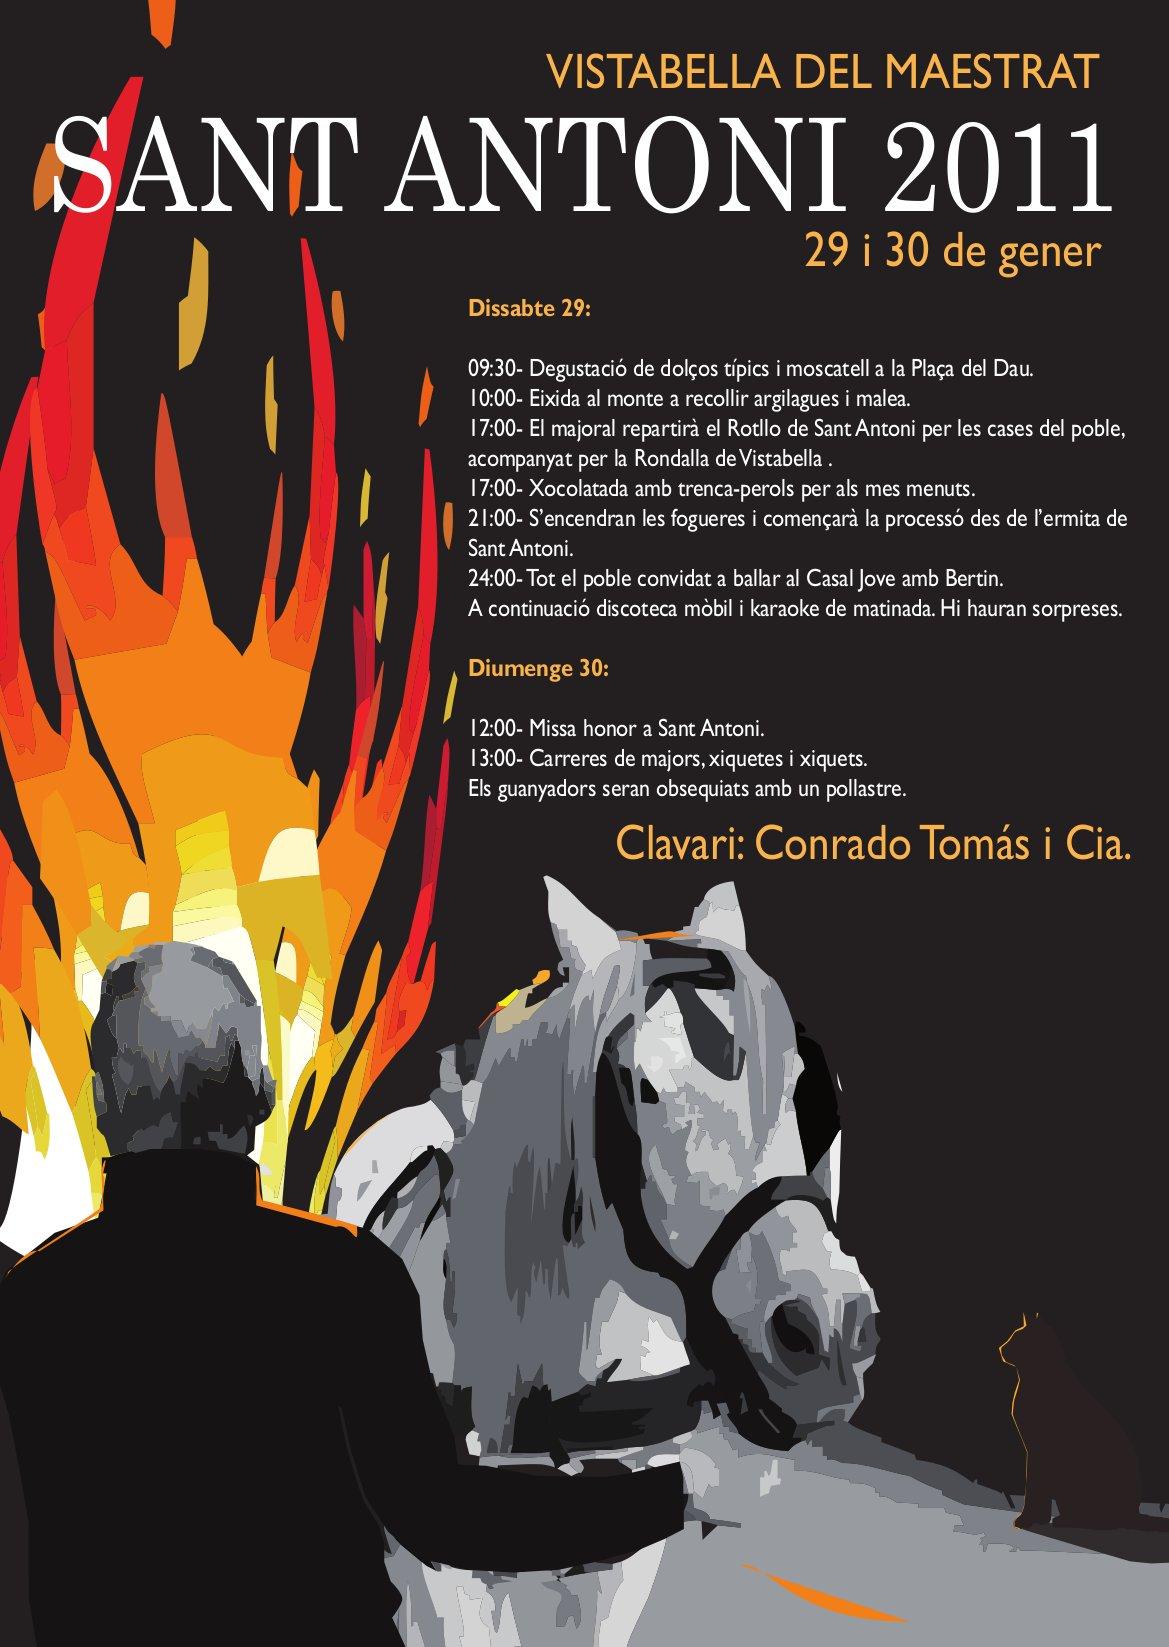 Cartell de Sant Antoni 2011 Vistabella del Maestrat